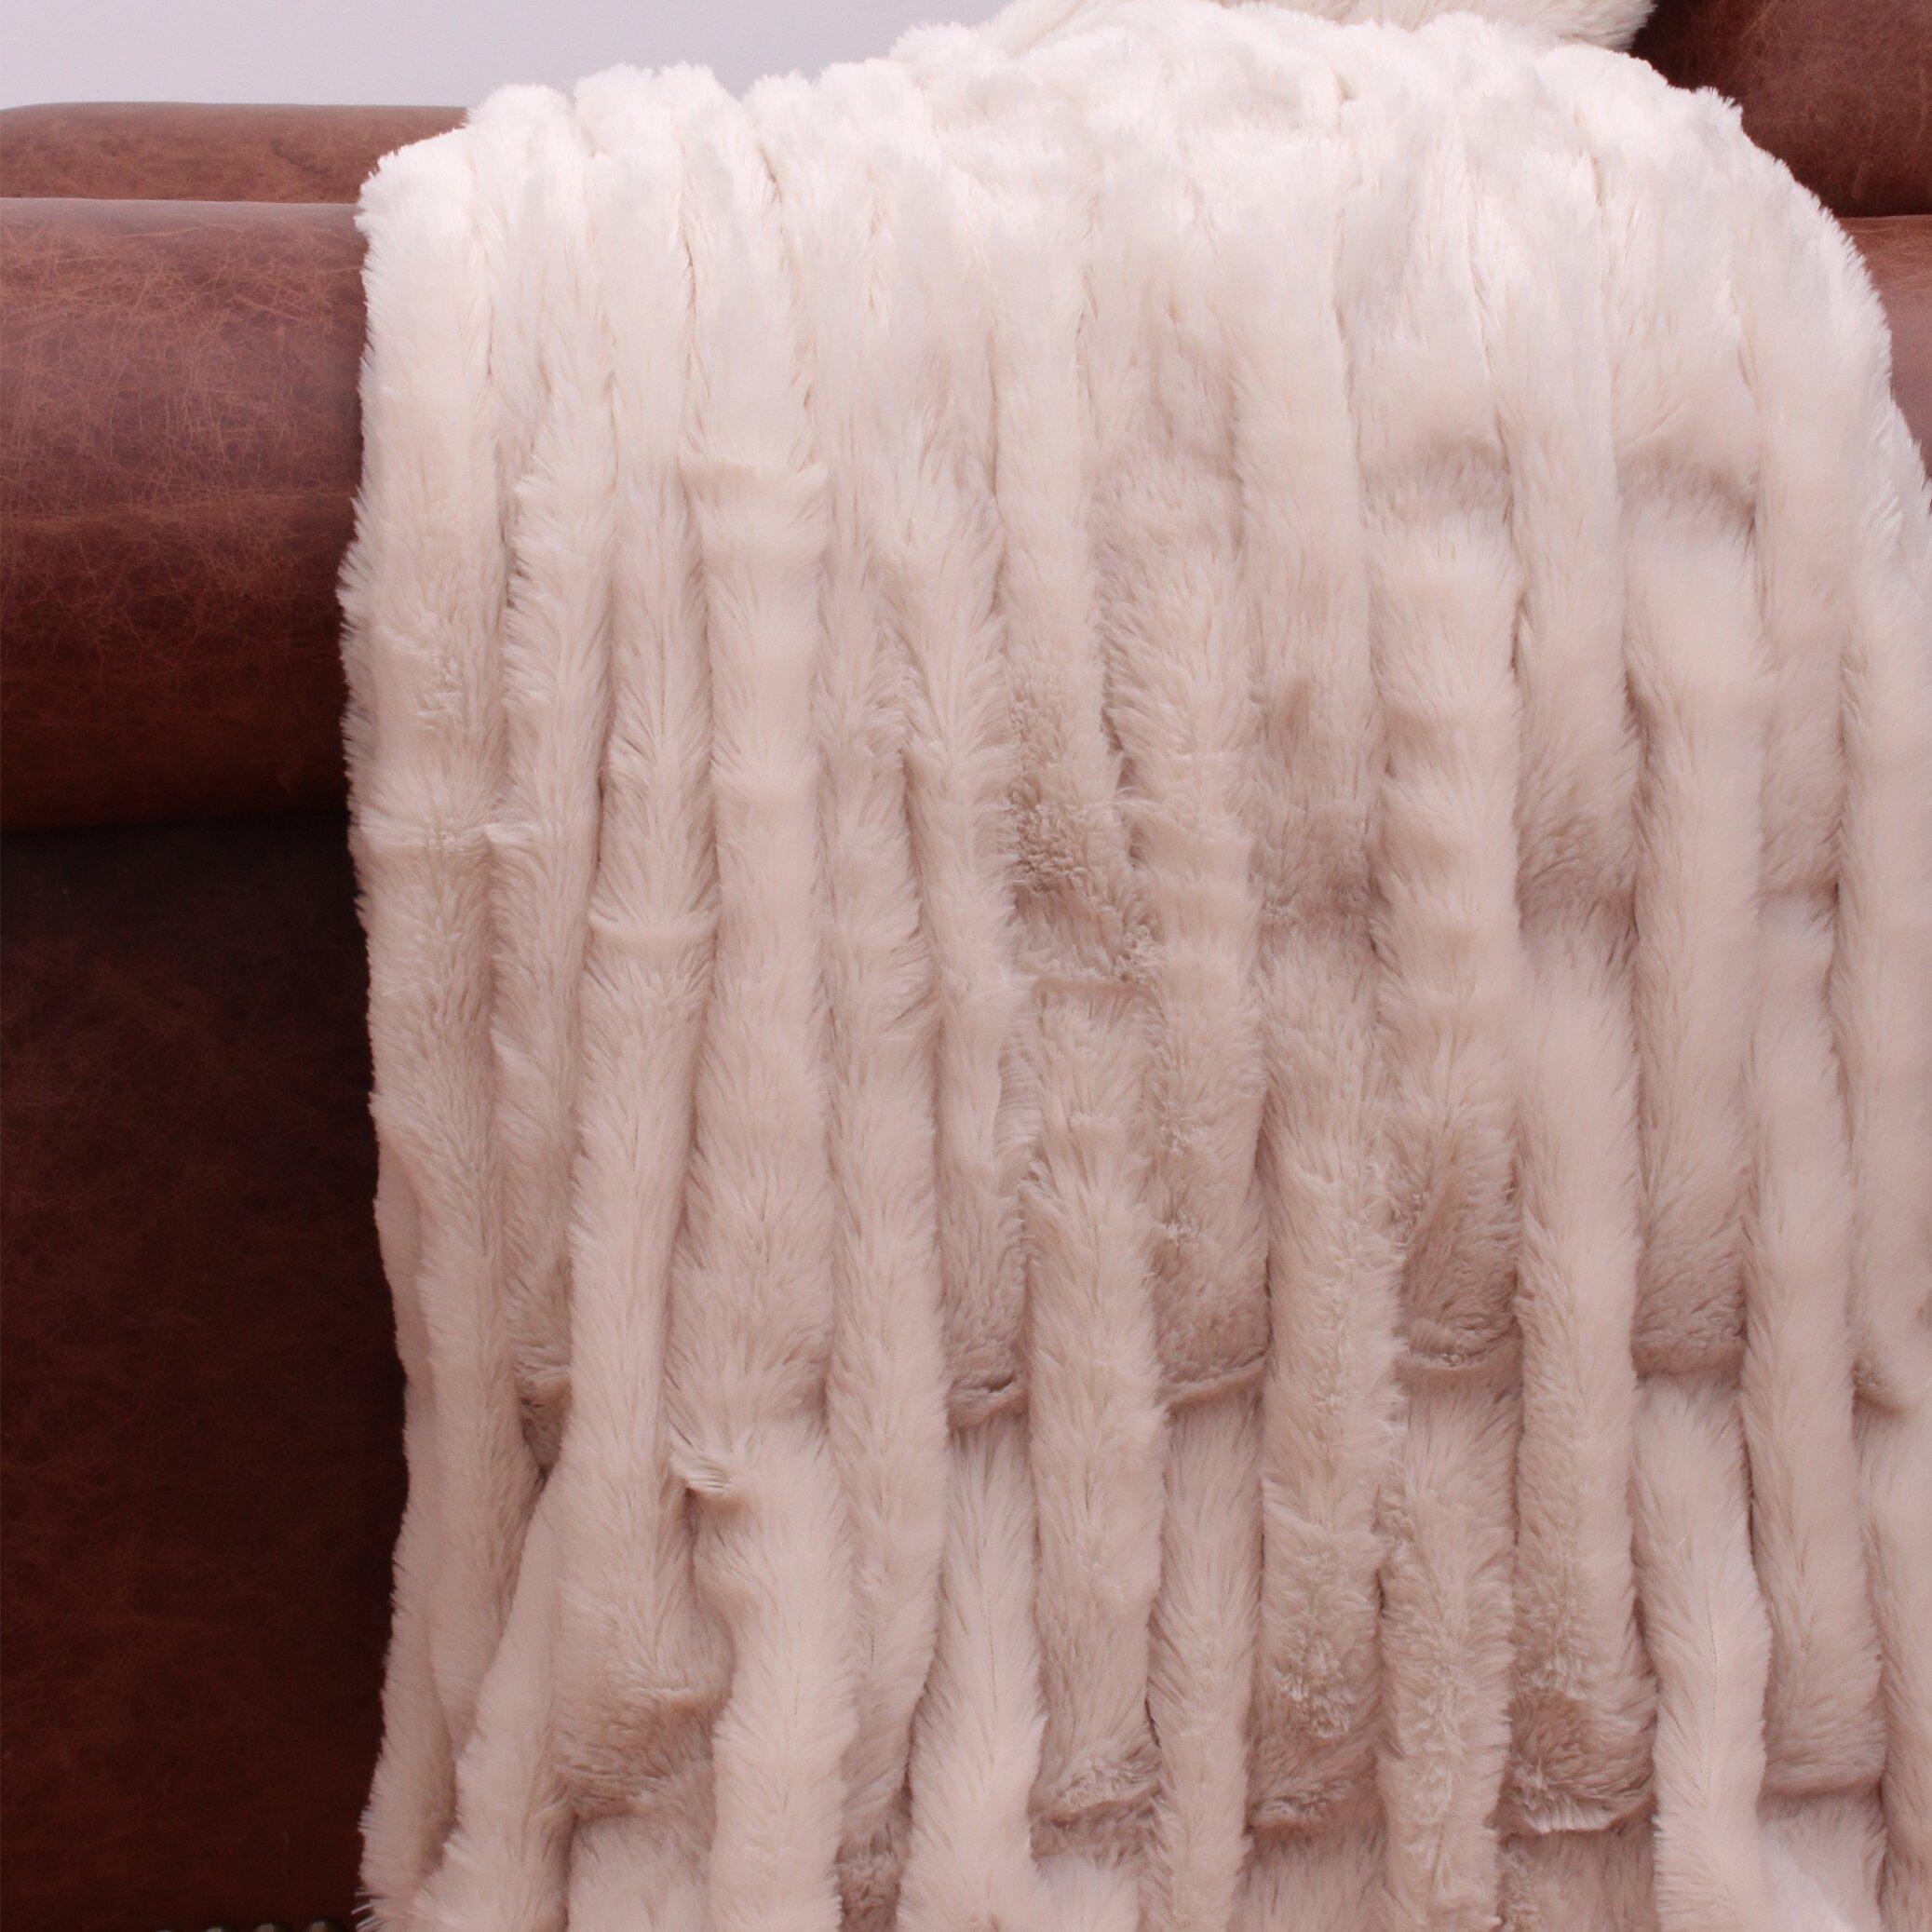 Marlo Furniture Reviews ... ... Faux Fur Blankets & Throws Thro by Marlo Lorenz SKU: THR1821